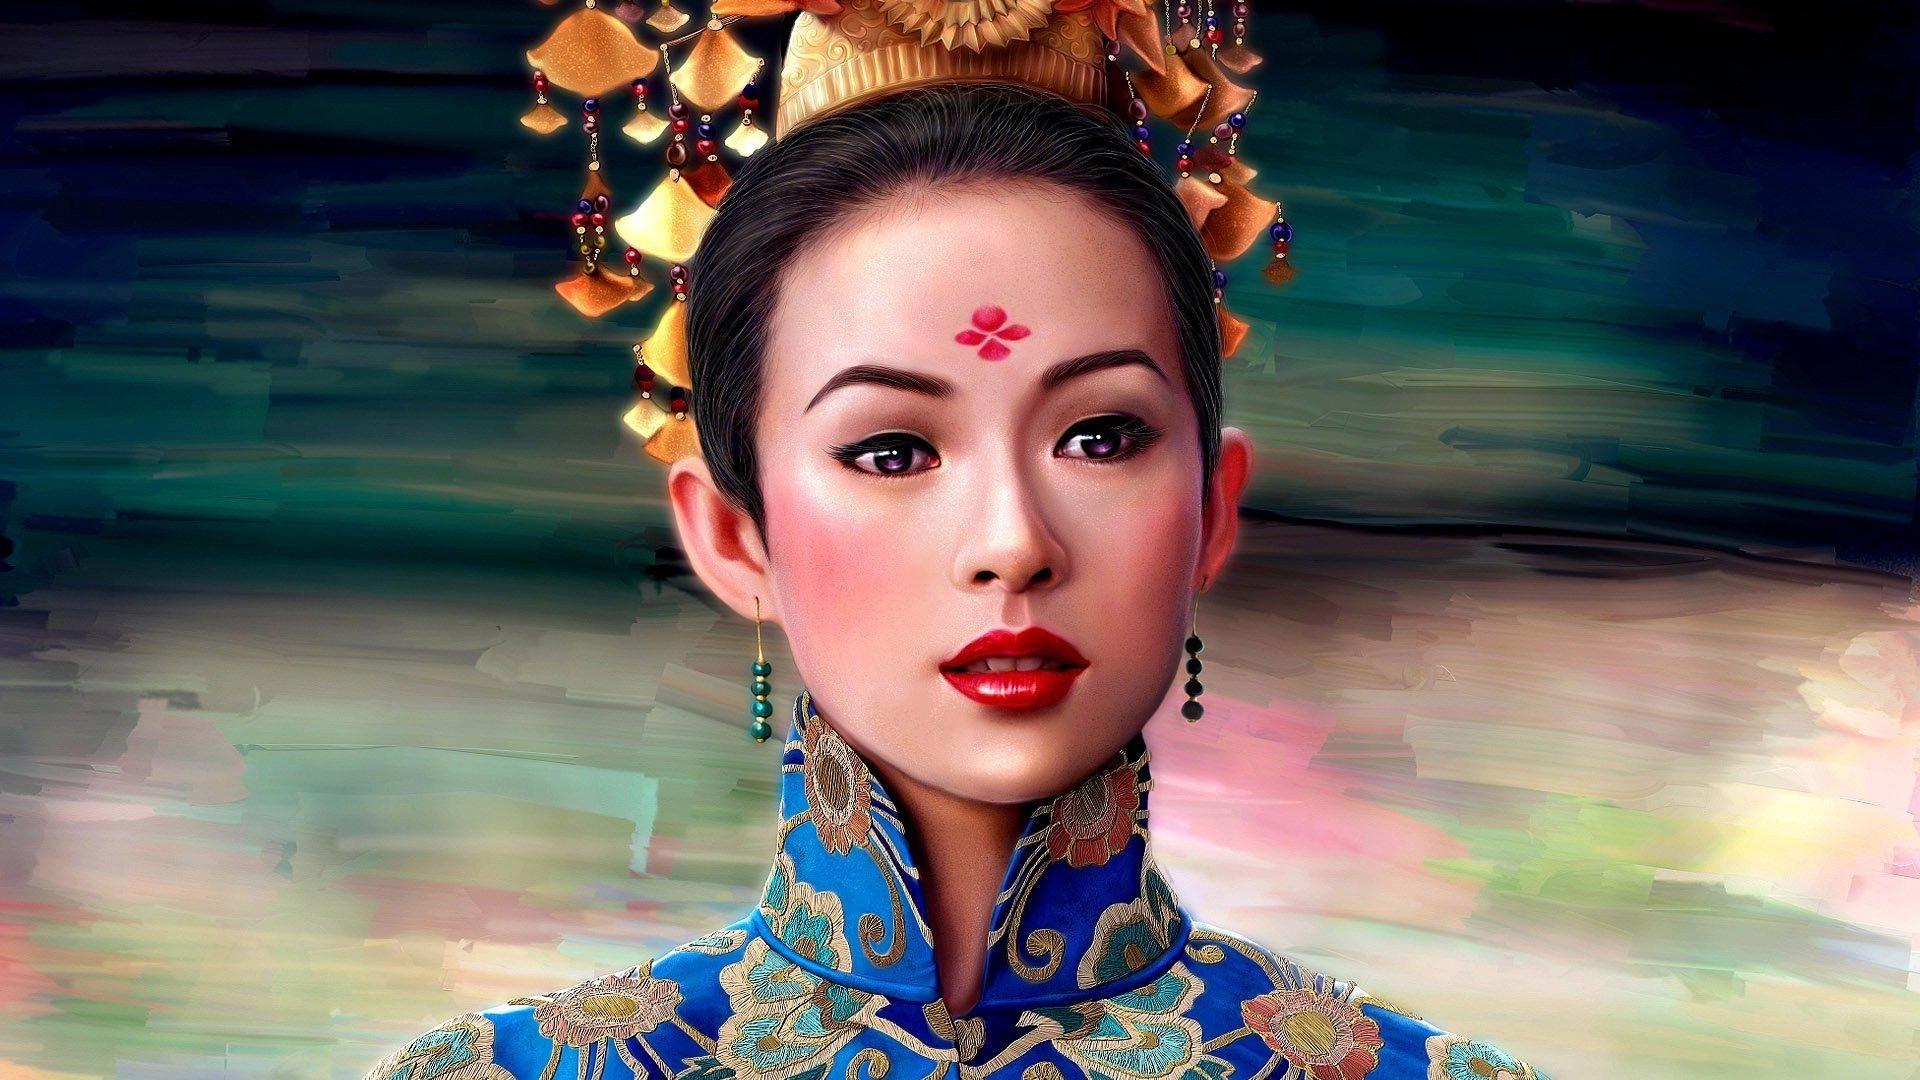 Girl Wallpaper: Geisha Girl Wallpaper Wall